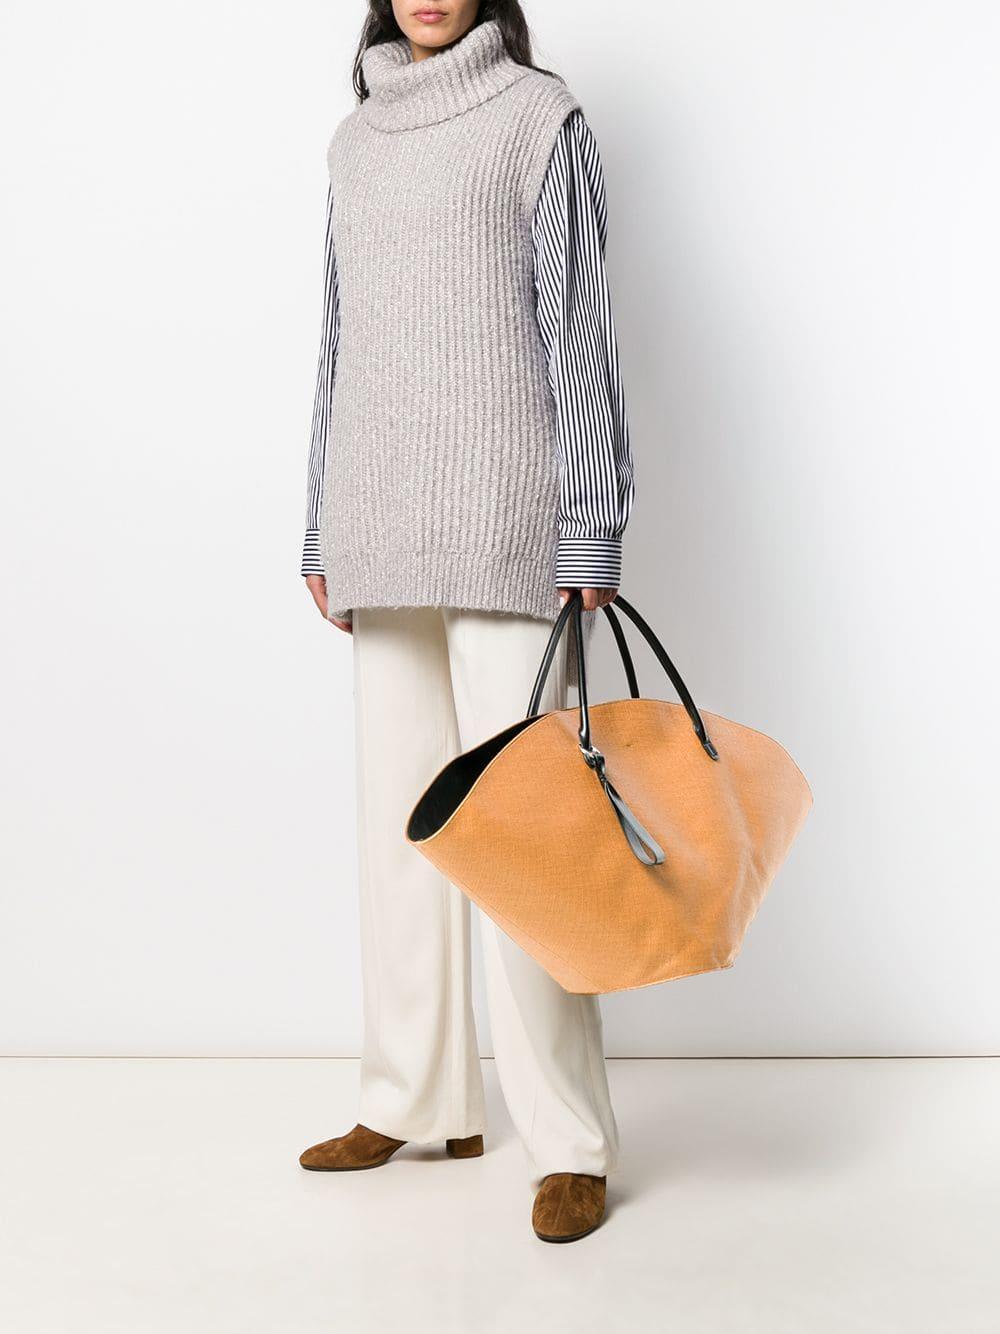 Jil Sander Leder 'Sombrero' Handtasche in Braun Pvh4J